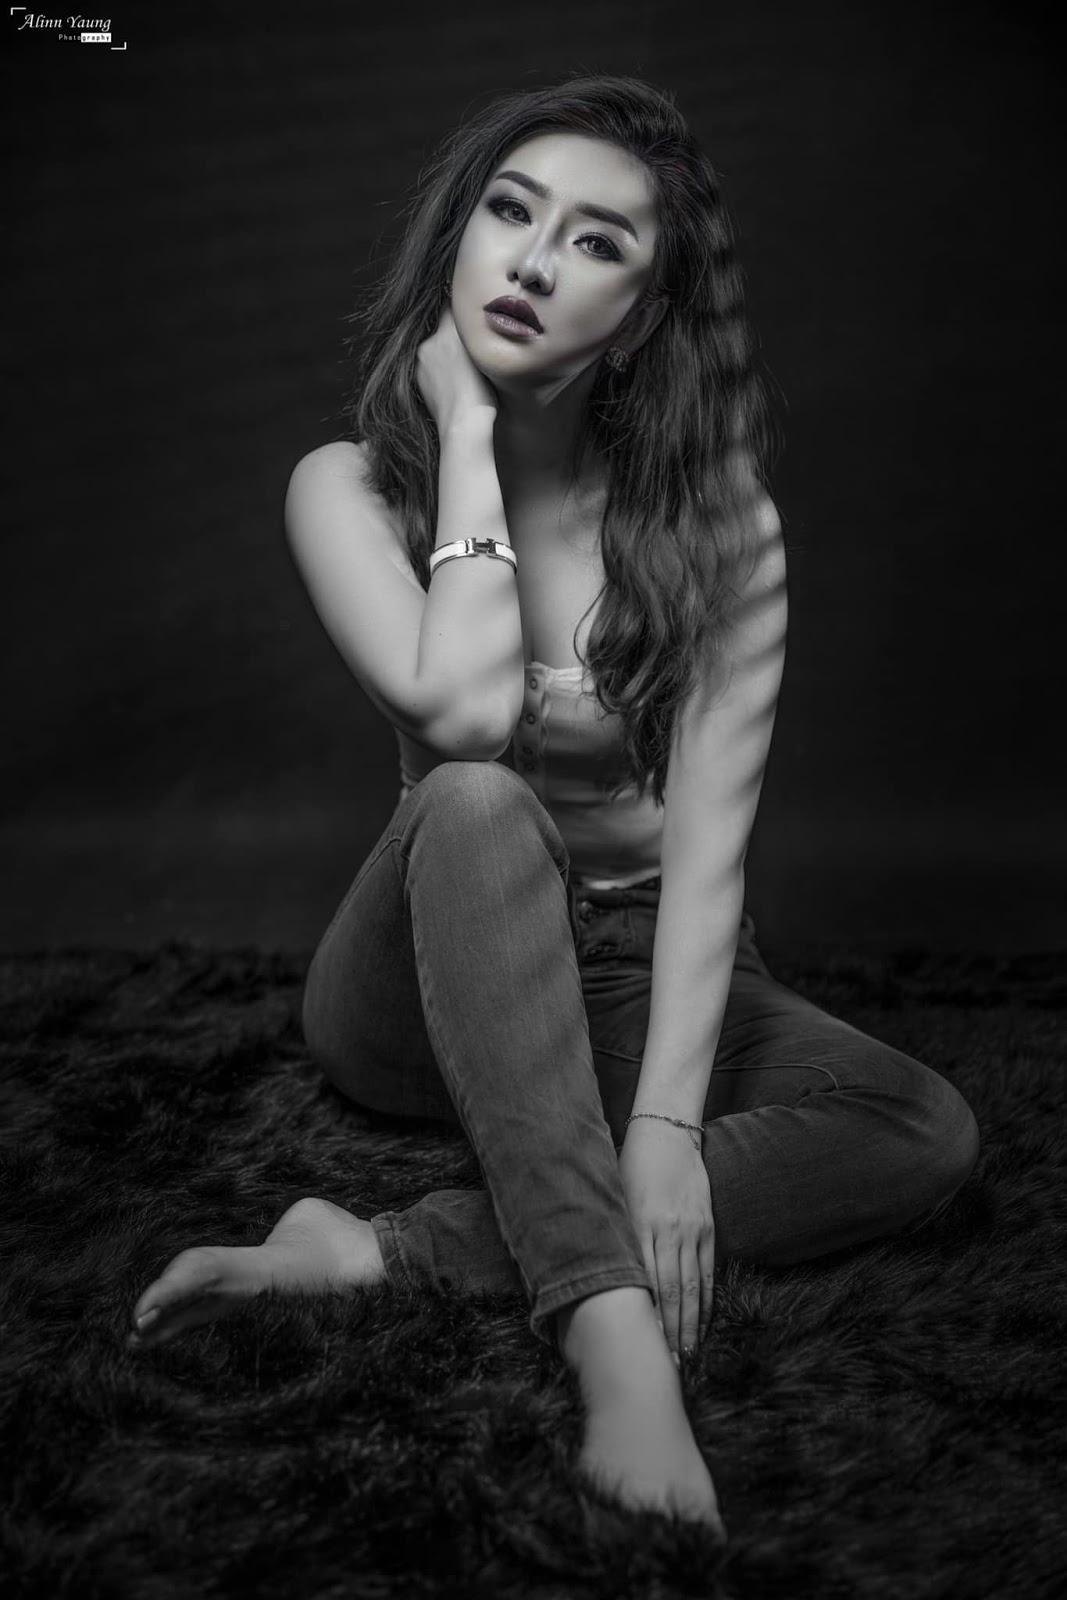 Nansu Yati Soe - Black and White Studio Photoshoot